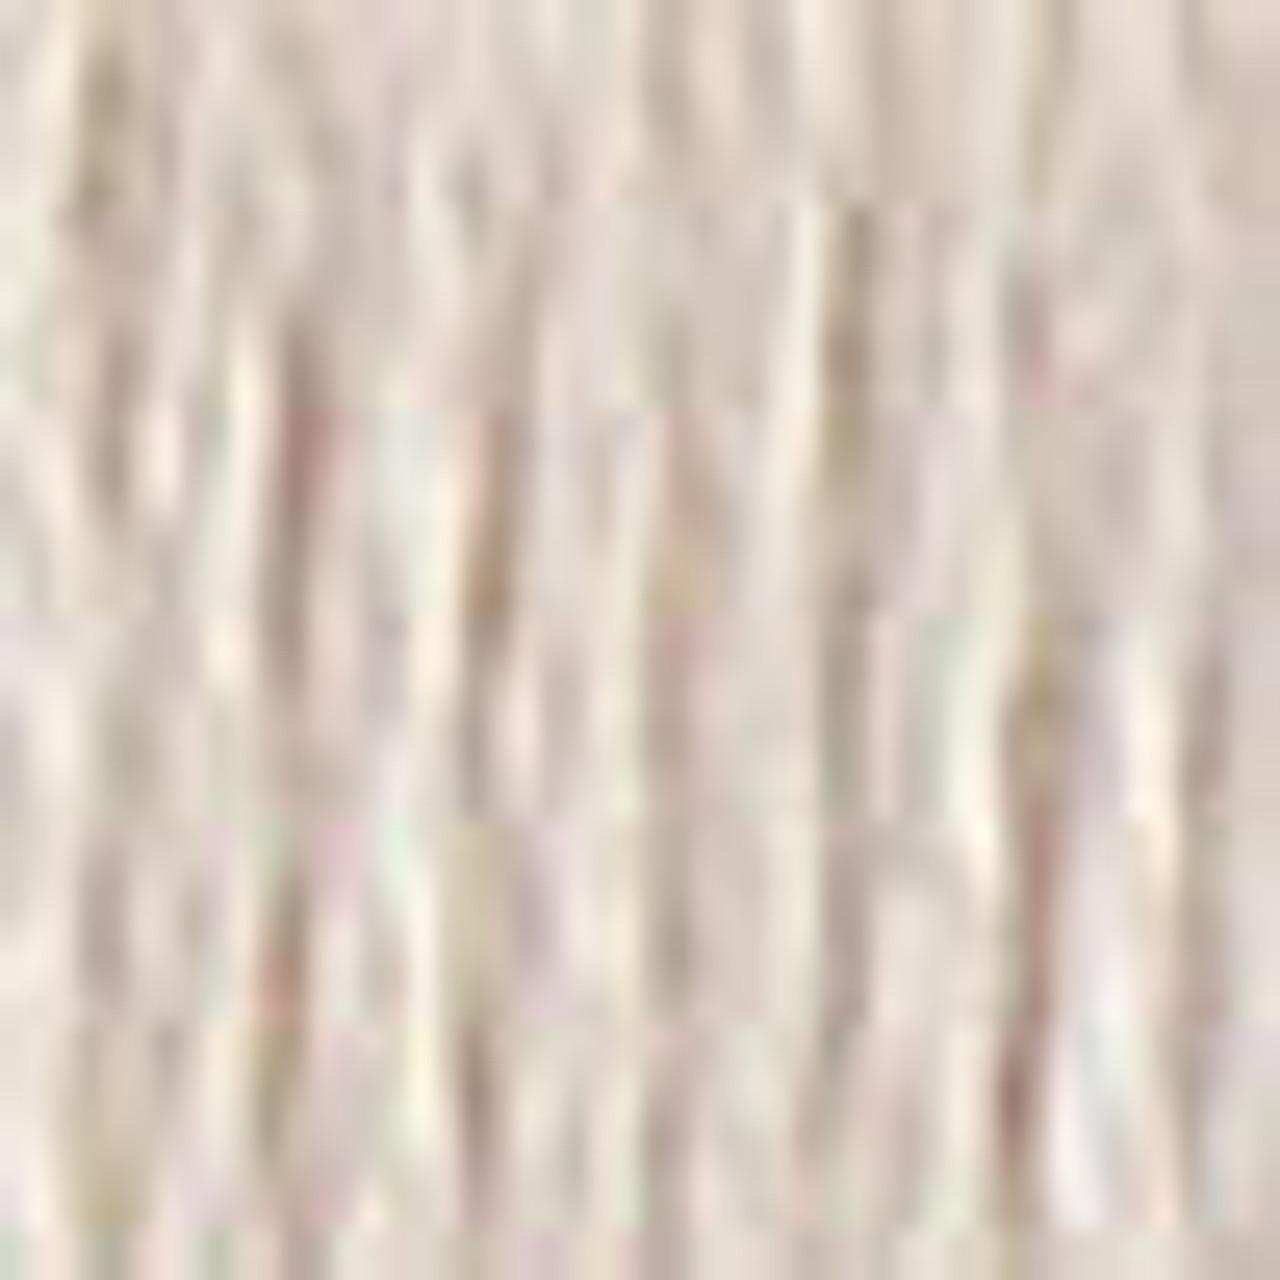 Colour 644 Medium Beige Gray DMC Stranded Cotton Embroidery Floss